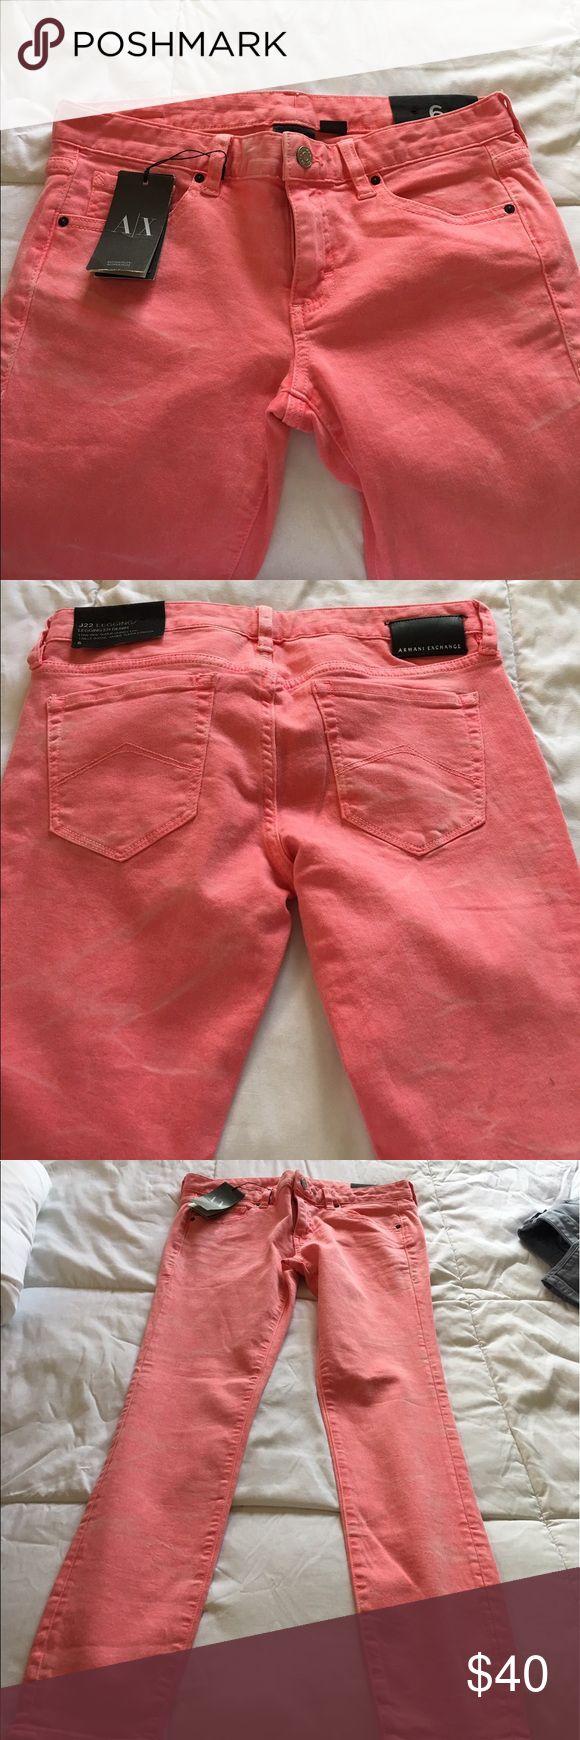 Armani exchange jeans AX JEANS size 6 low rose super skinny leggings en denim A/X Armani Exchange Jeans Skinny